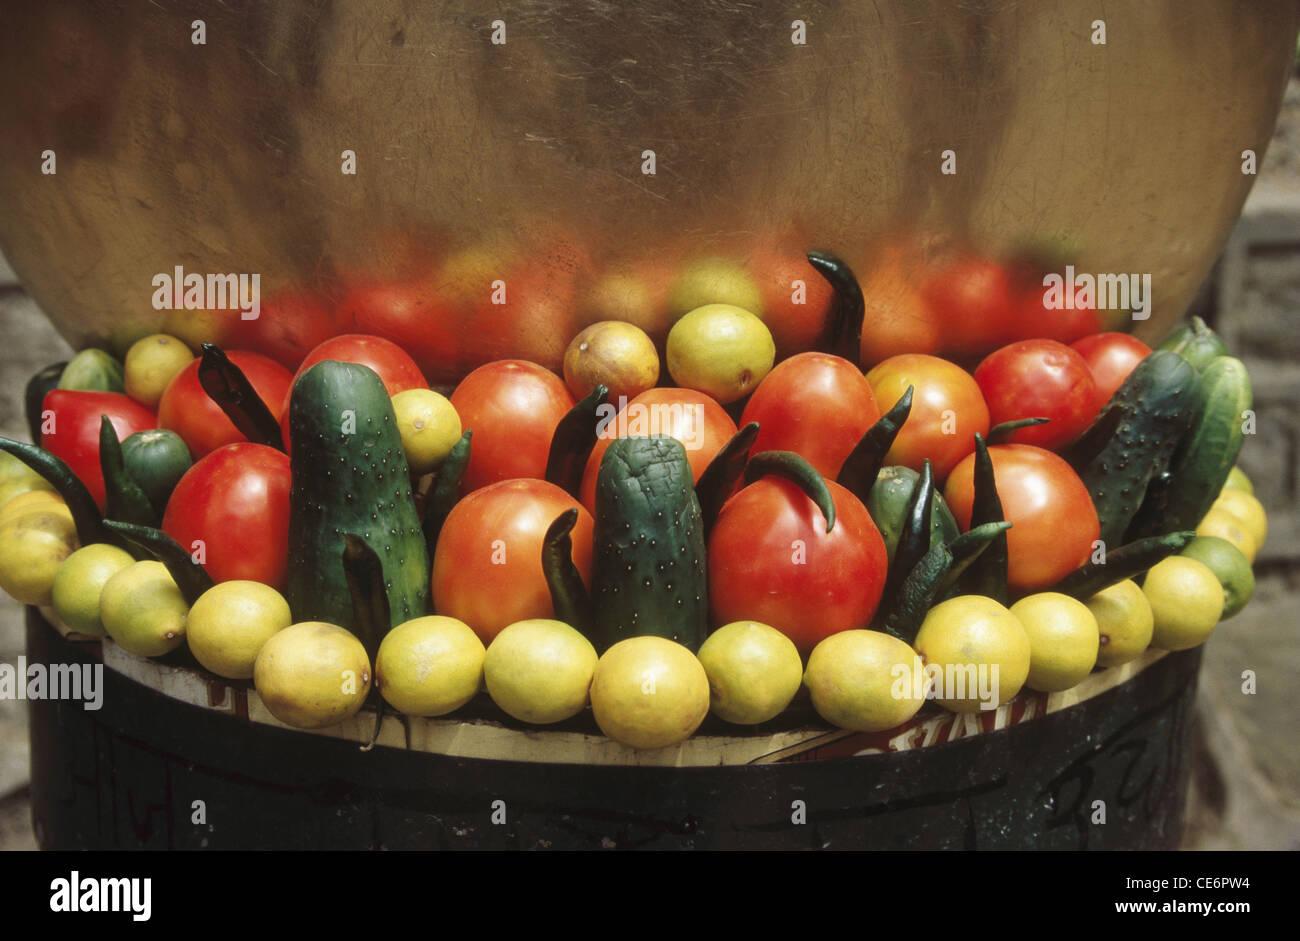 Indian snack fastfood items red tomato yellow lemon green cucumber green chilly ; Shimla ; himachal pradesh ; india - Stock Image